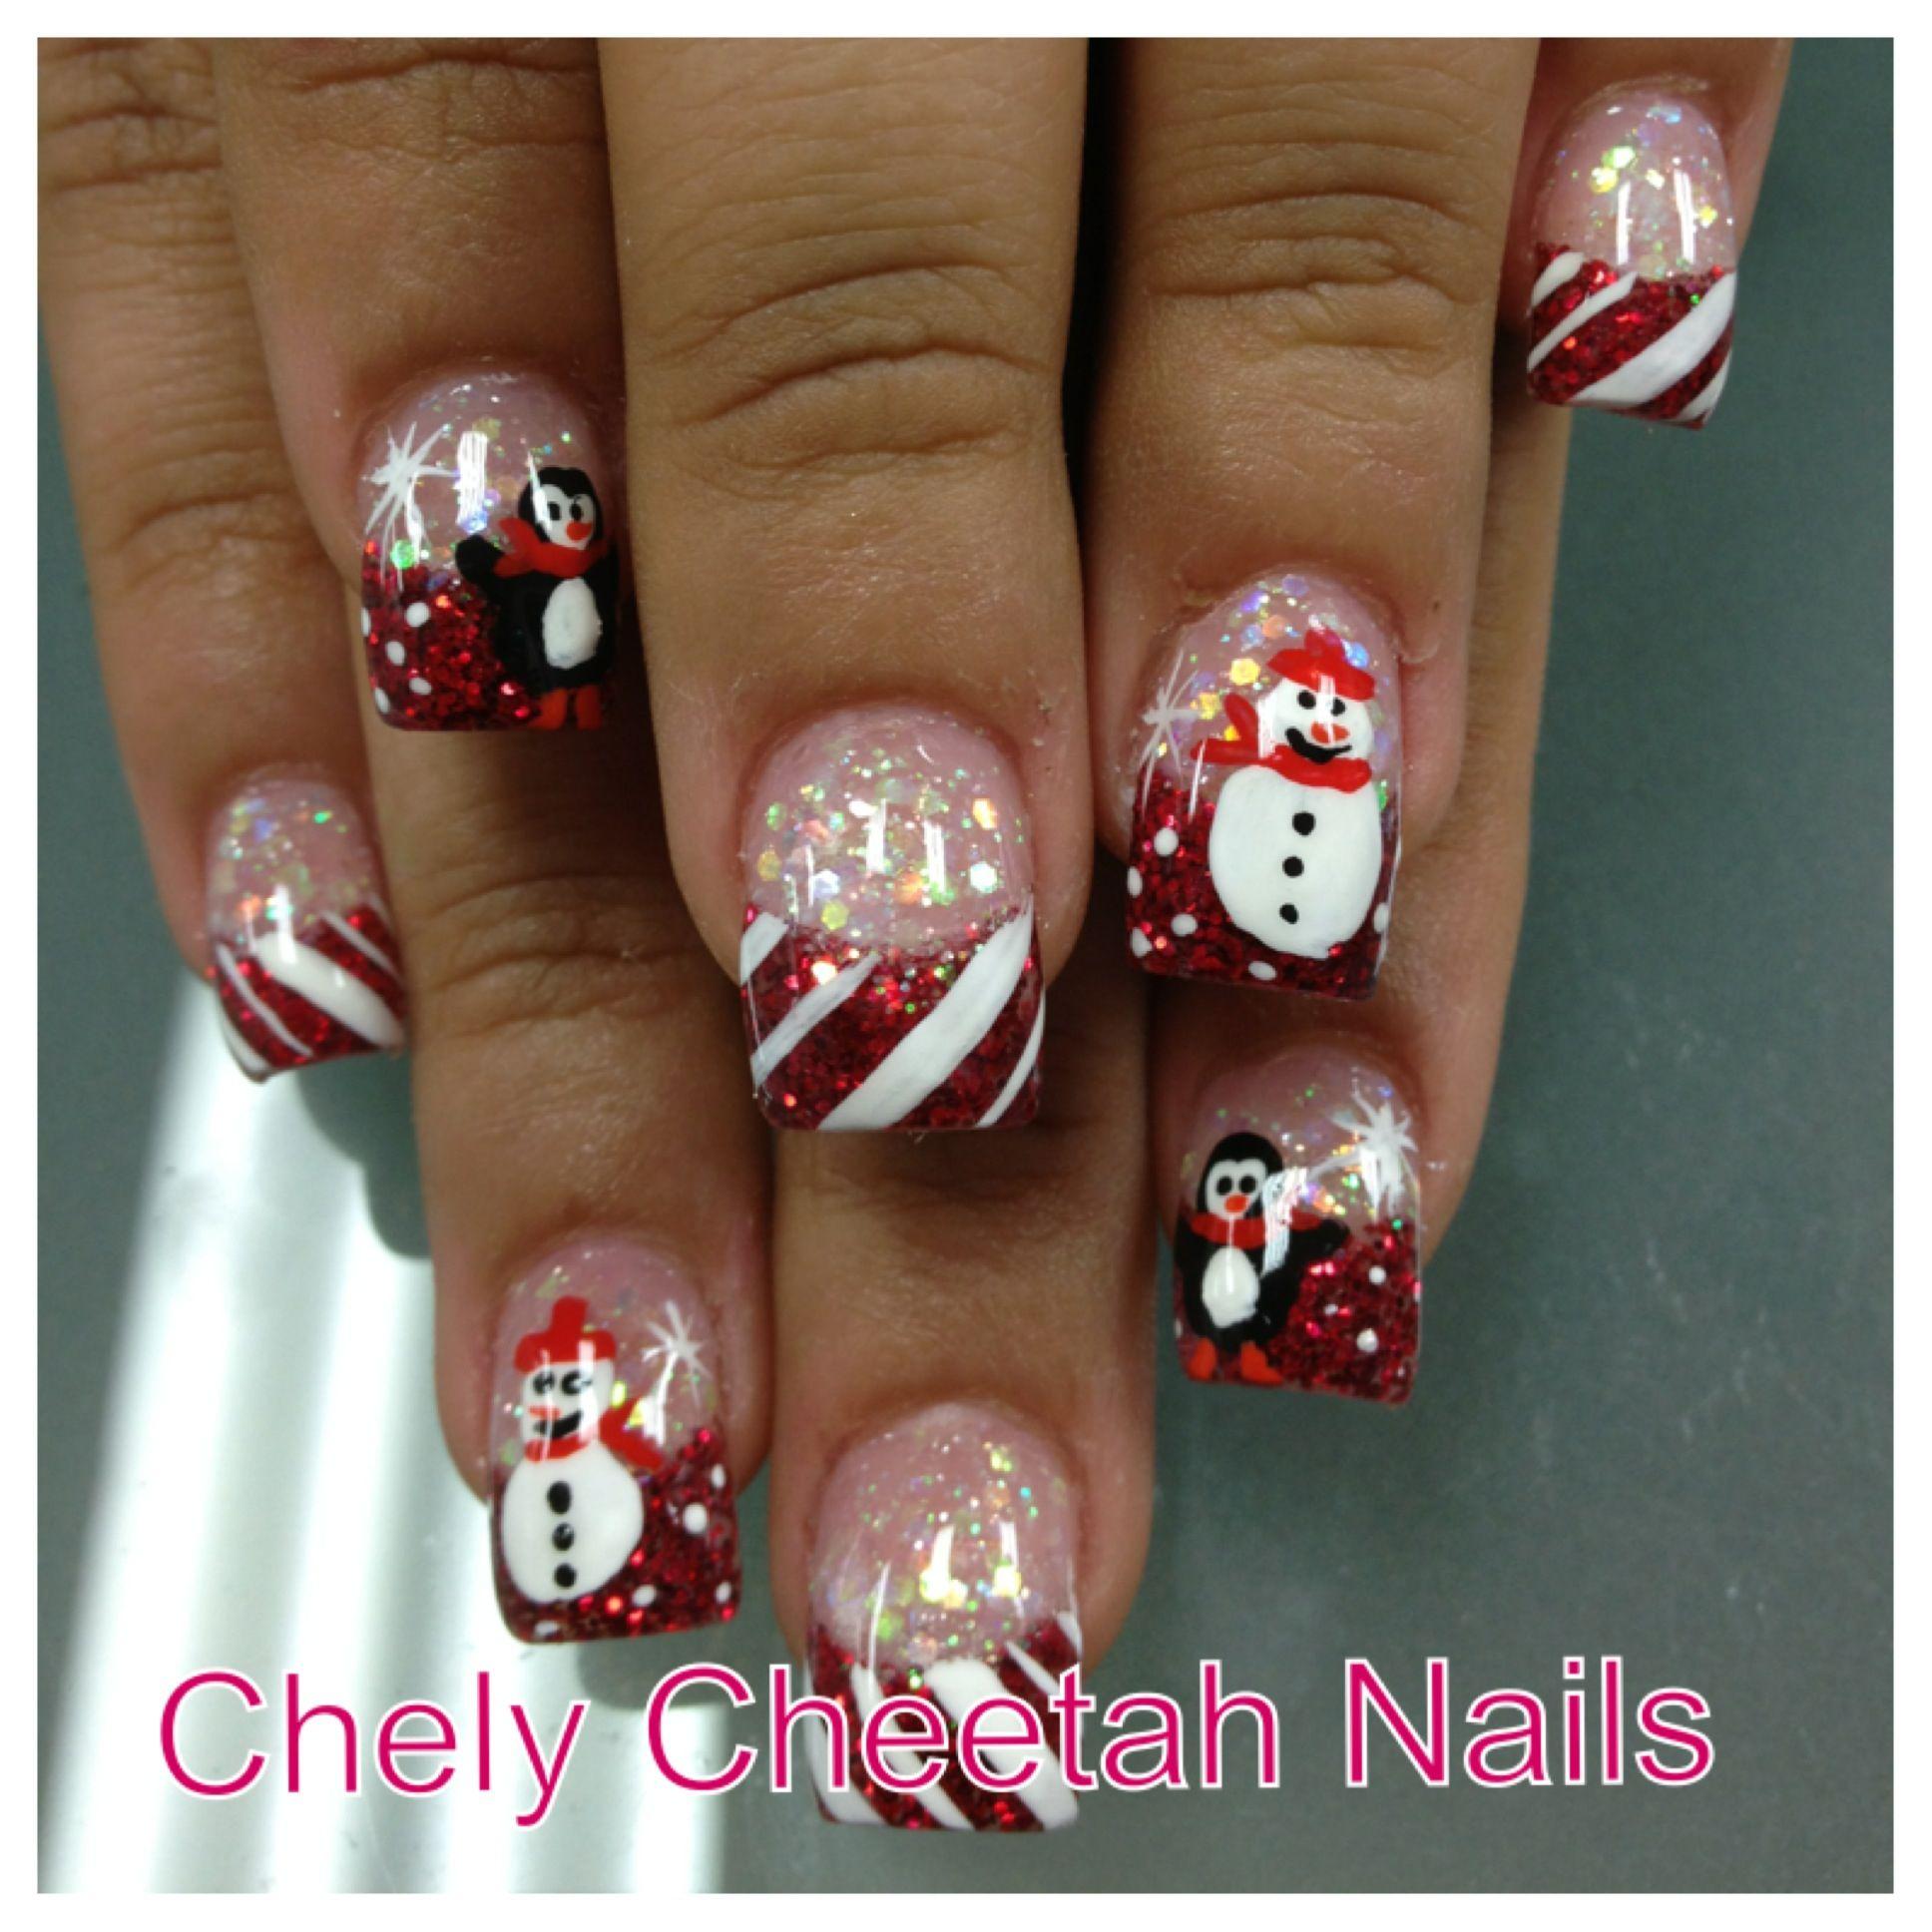 chely cheetah nails. acrylic